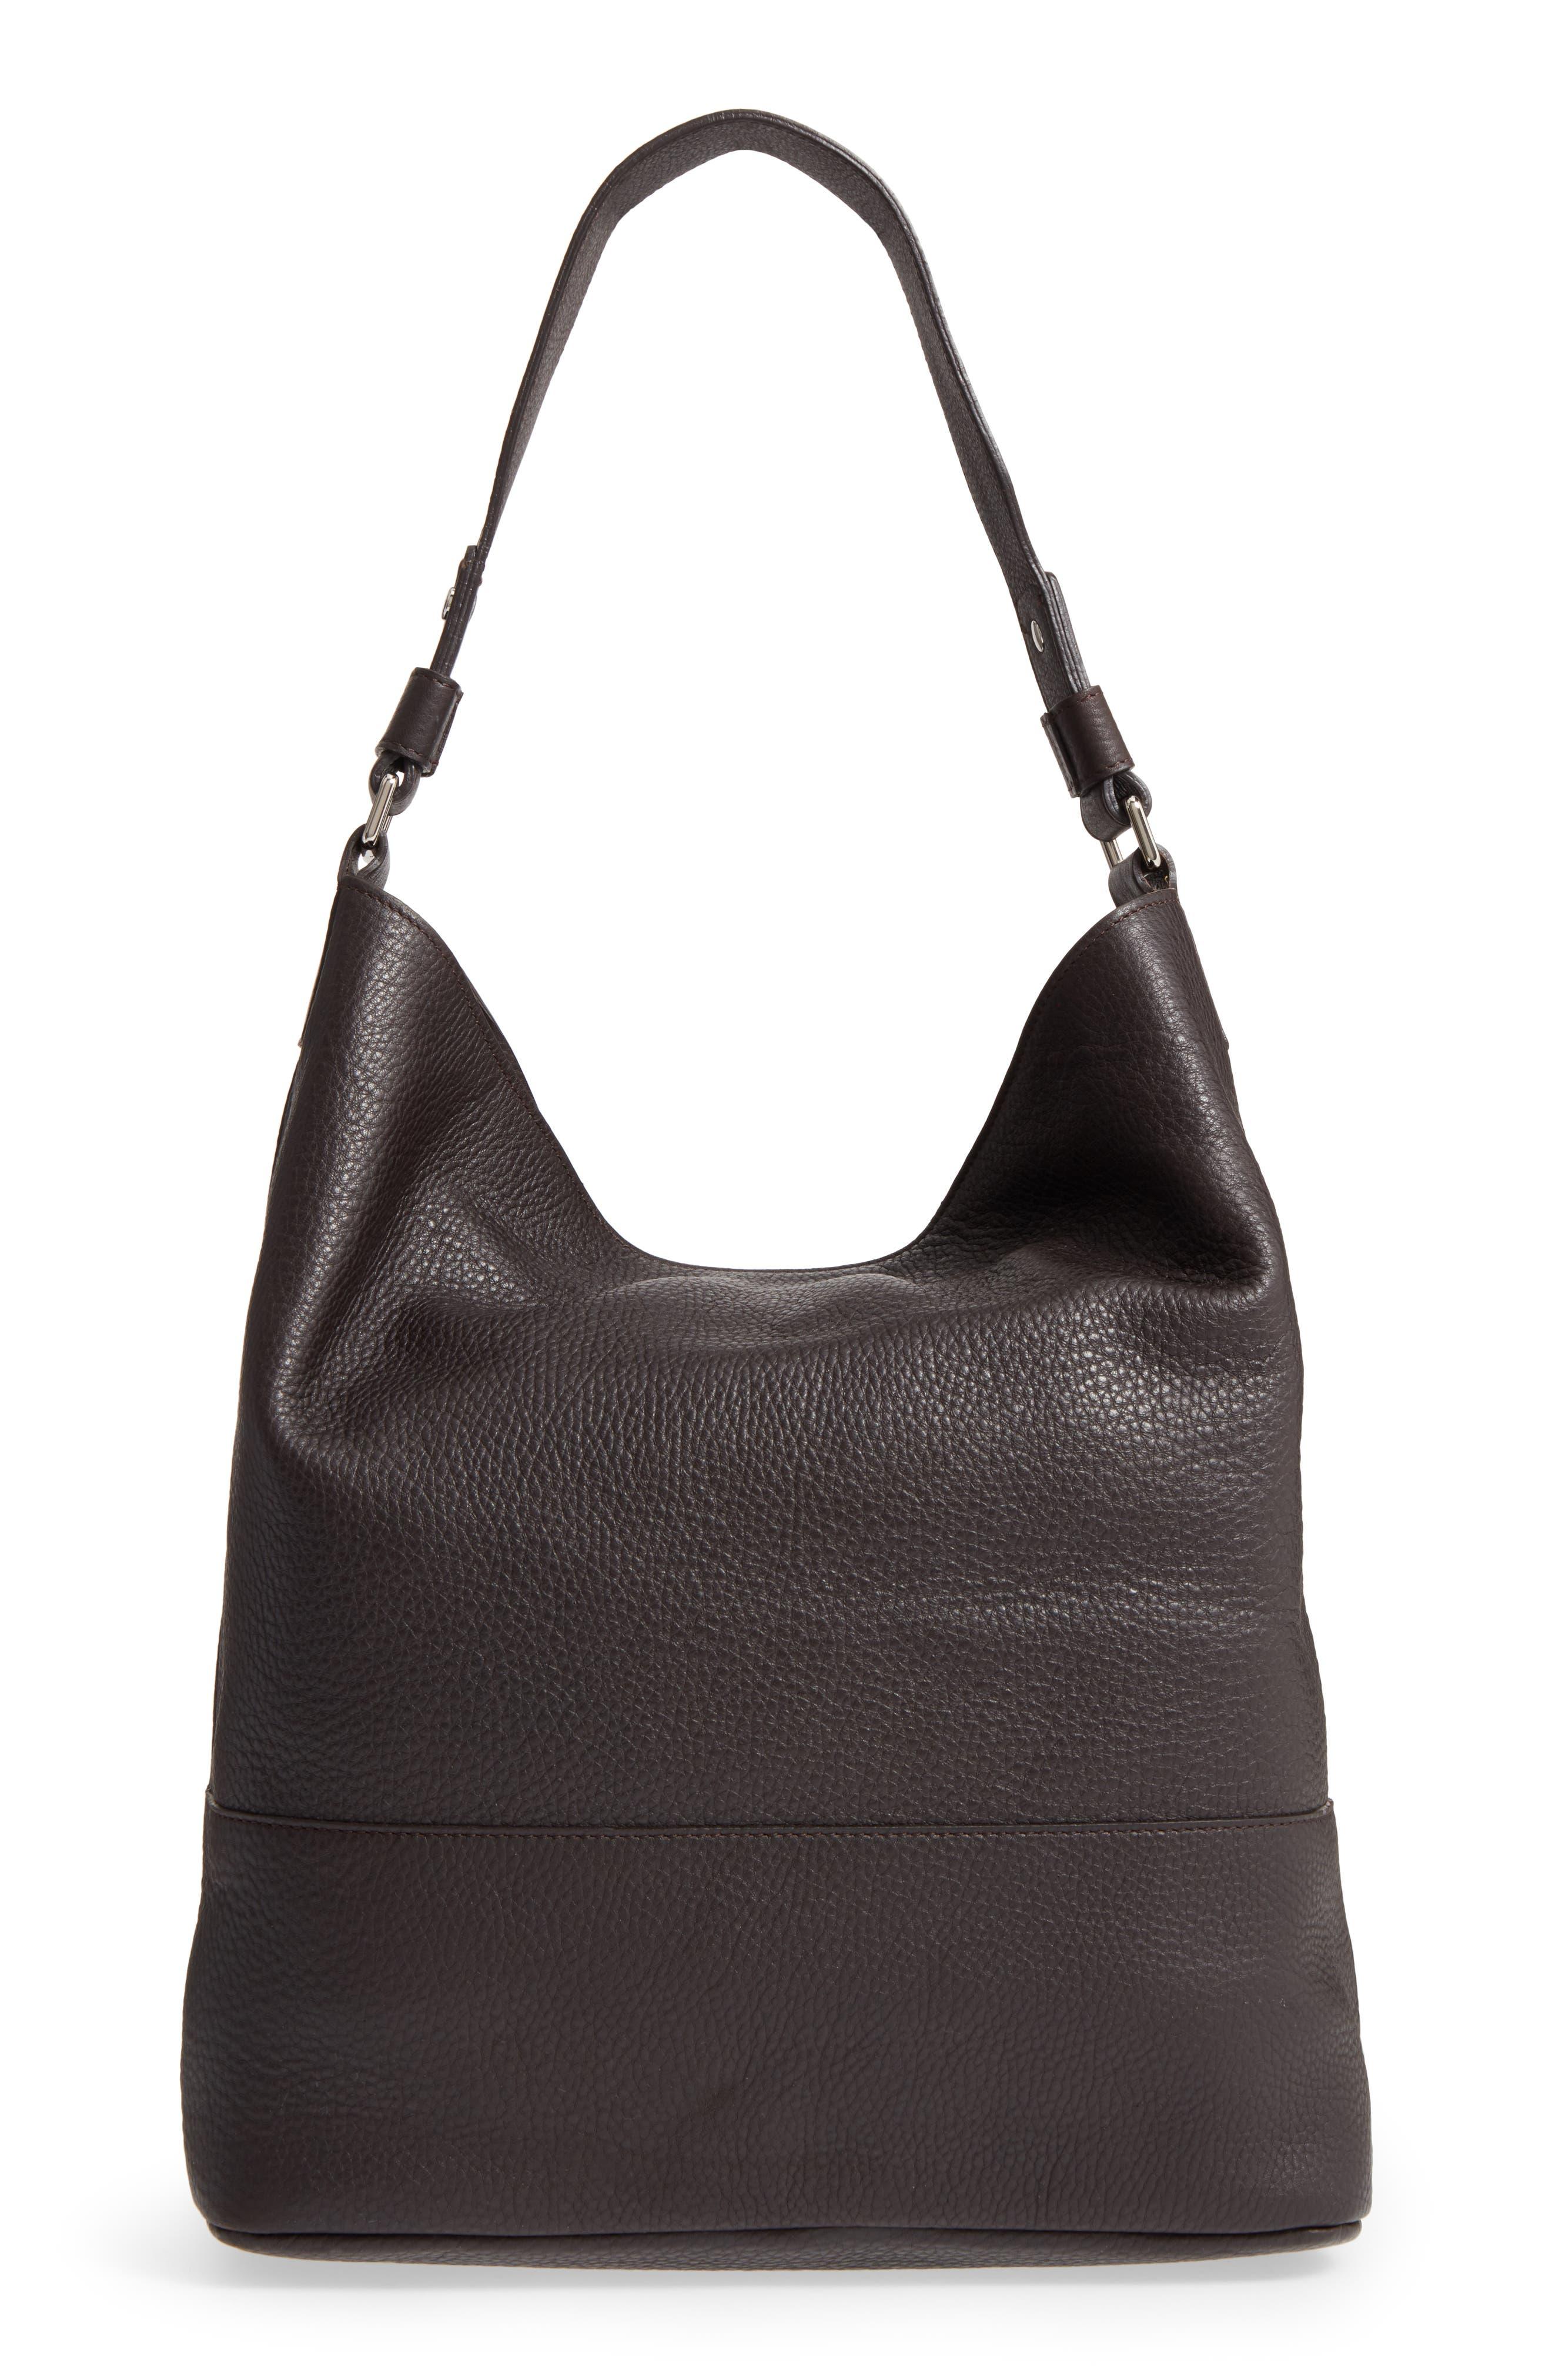 Alternate Image 2  - Shinola Relaxed Calfskin Leather Hobo Bag